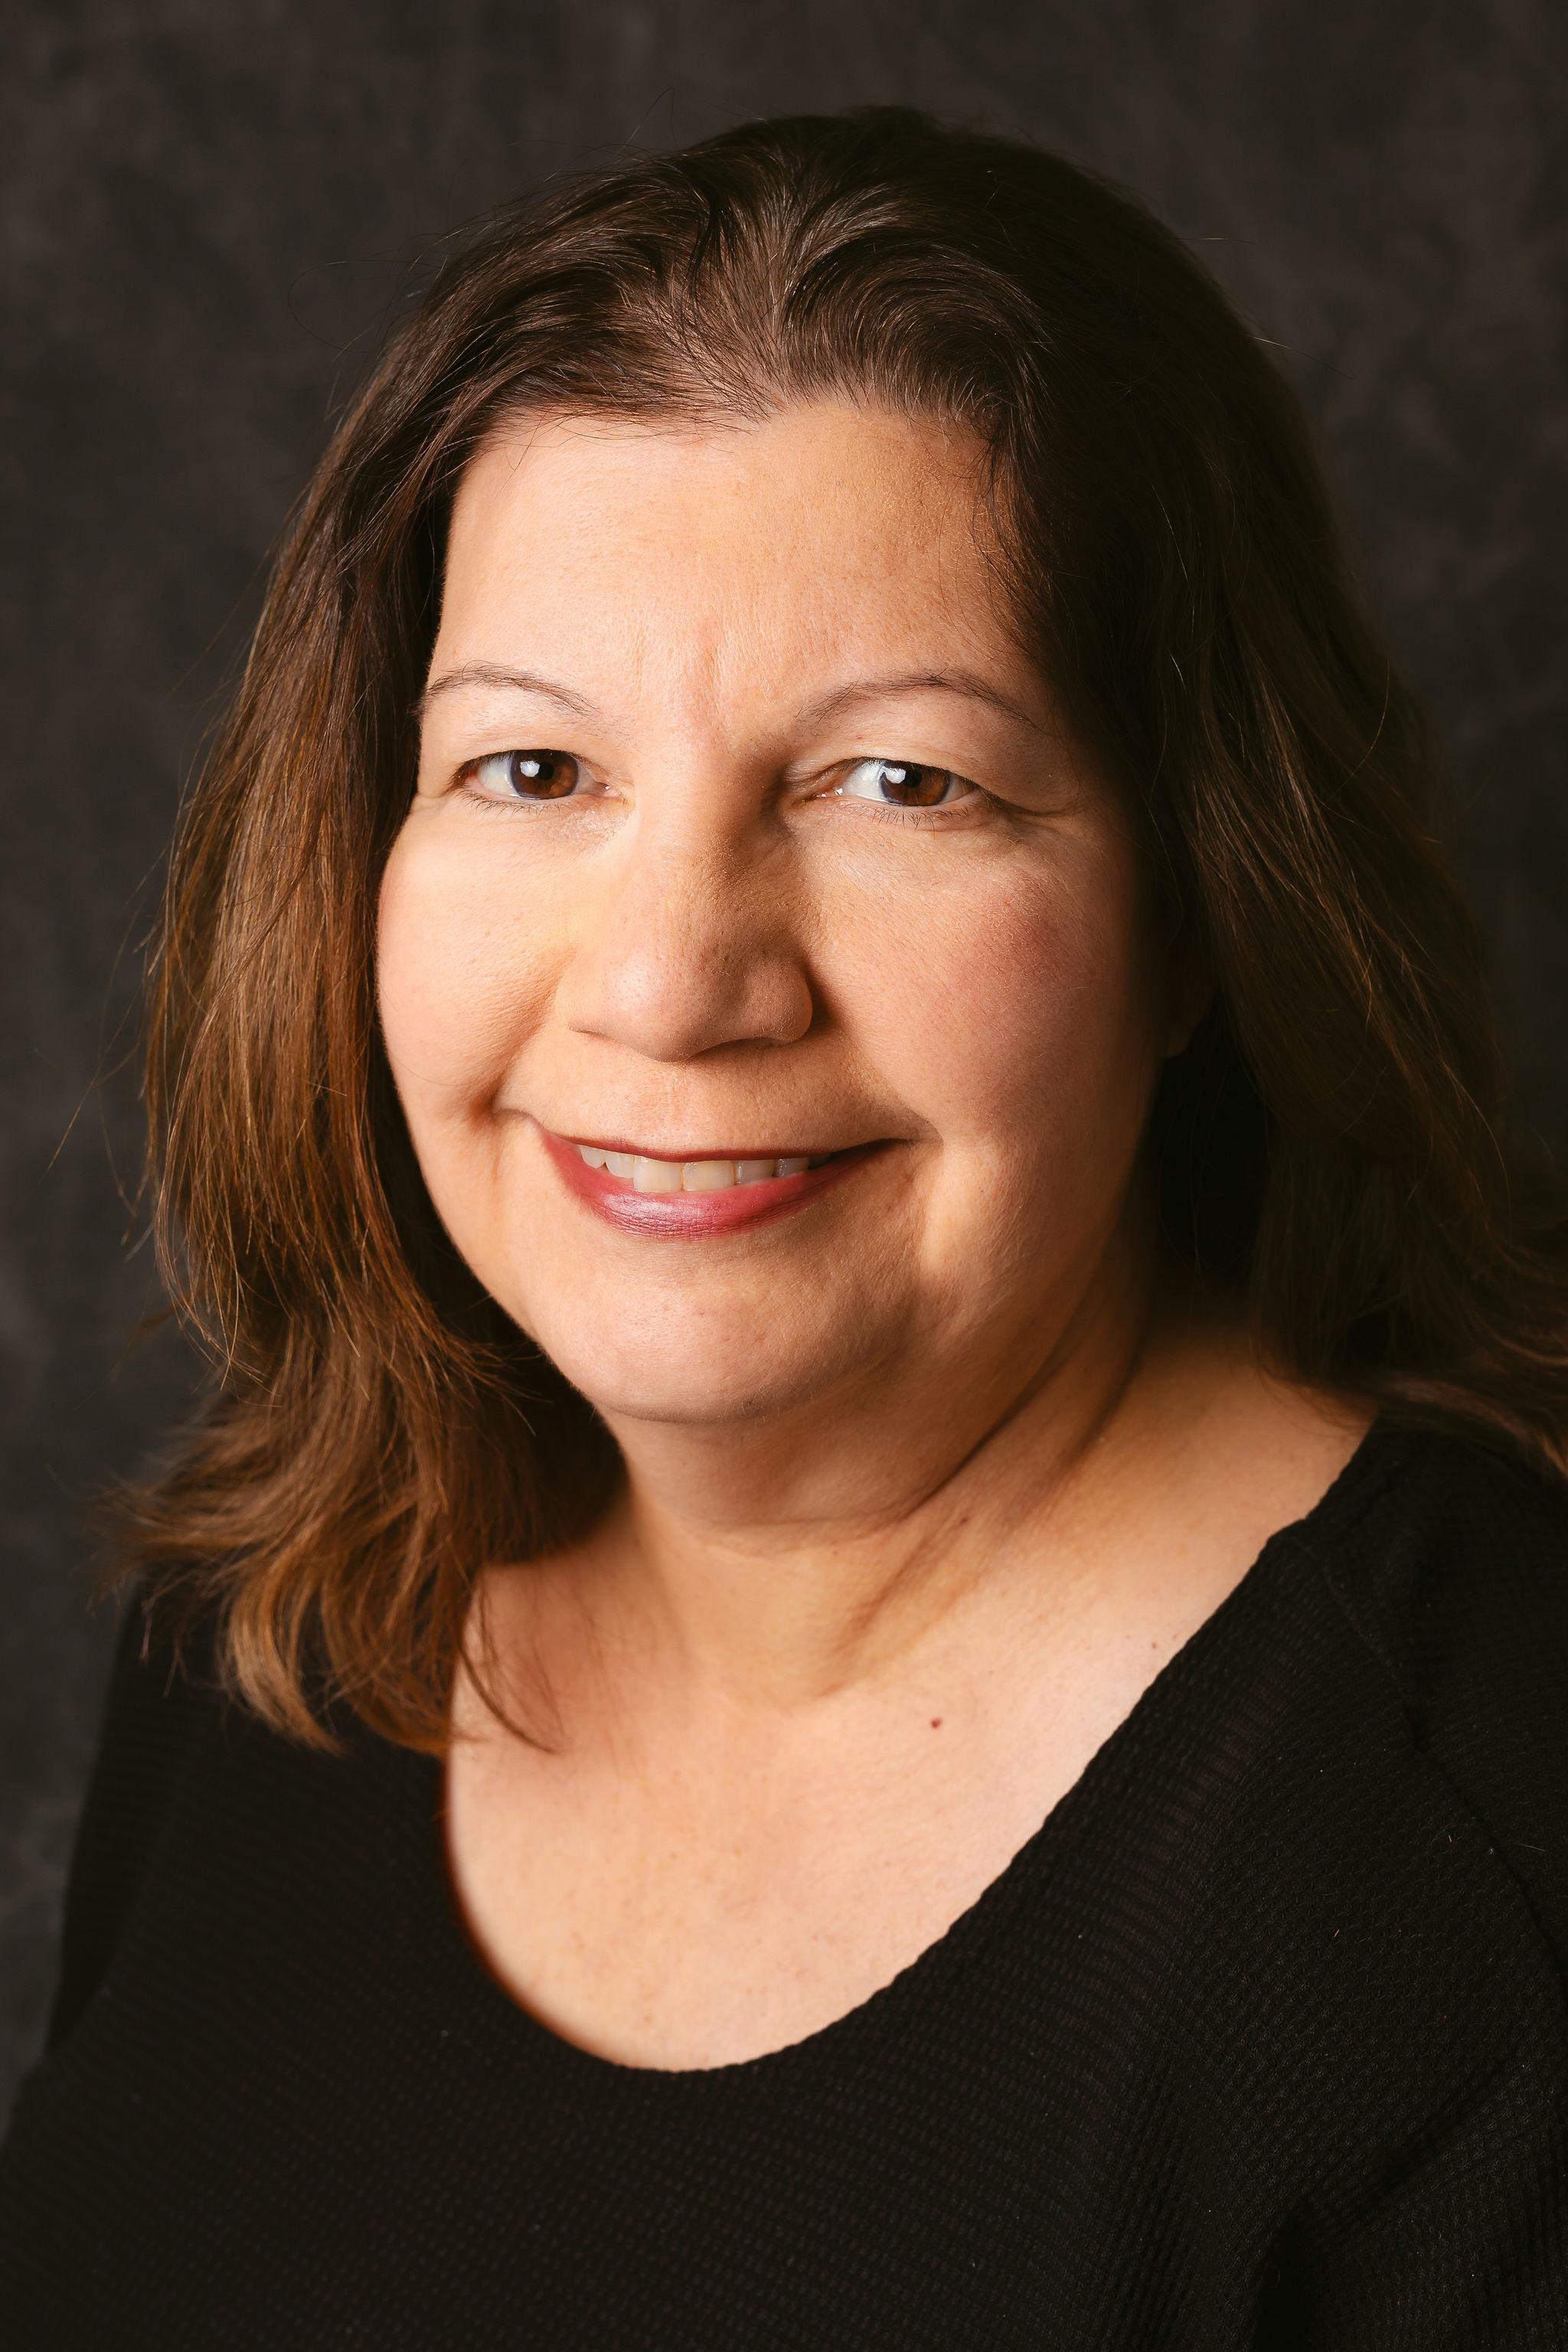 Deborah McLaughlin